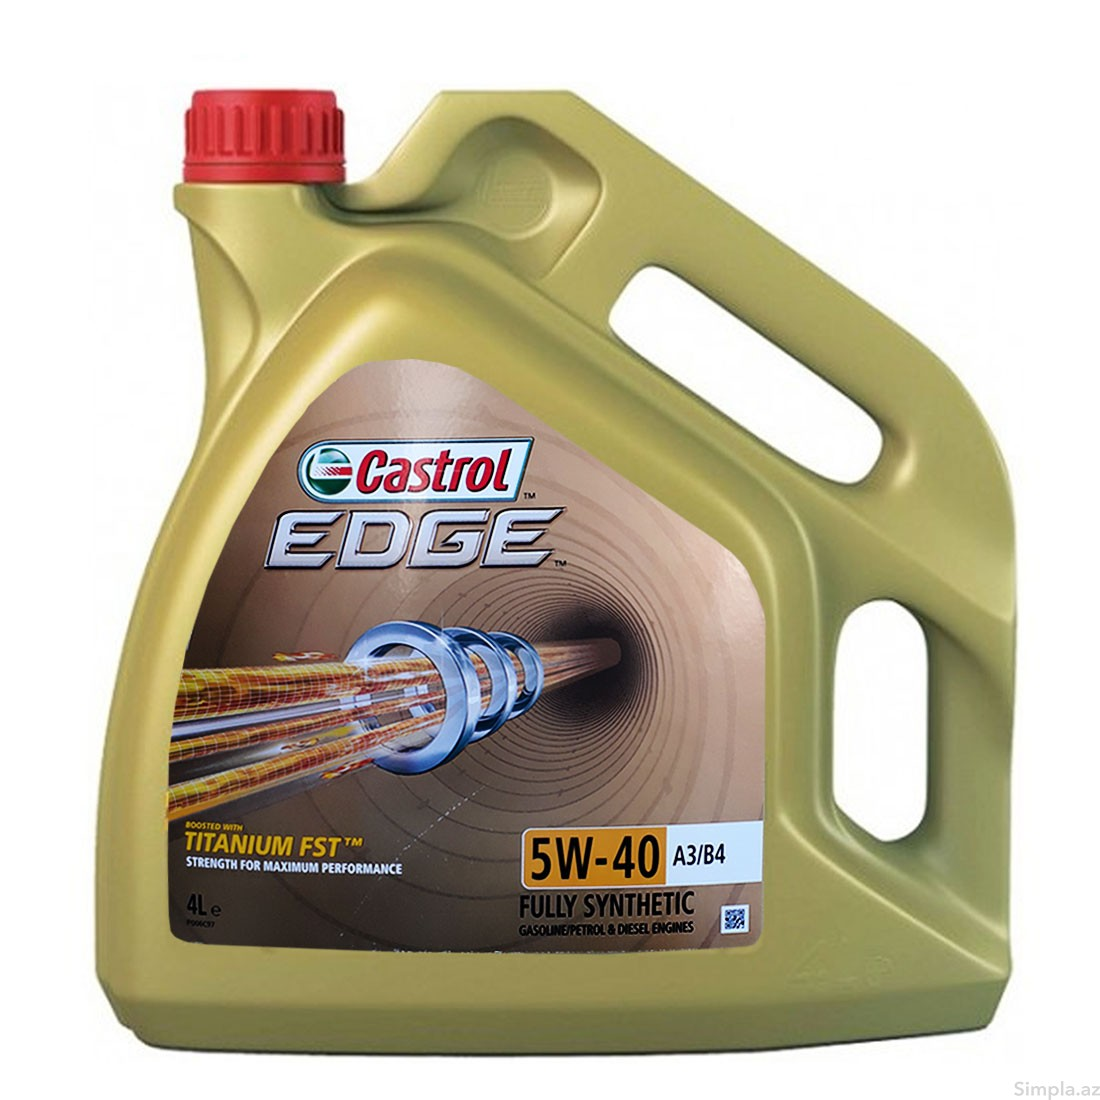 castrol Моторное масло CASTROL EDGE 5W-40 A3/B4 (4л) 15BA5D